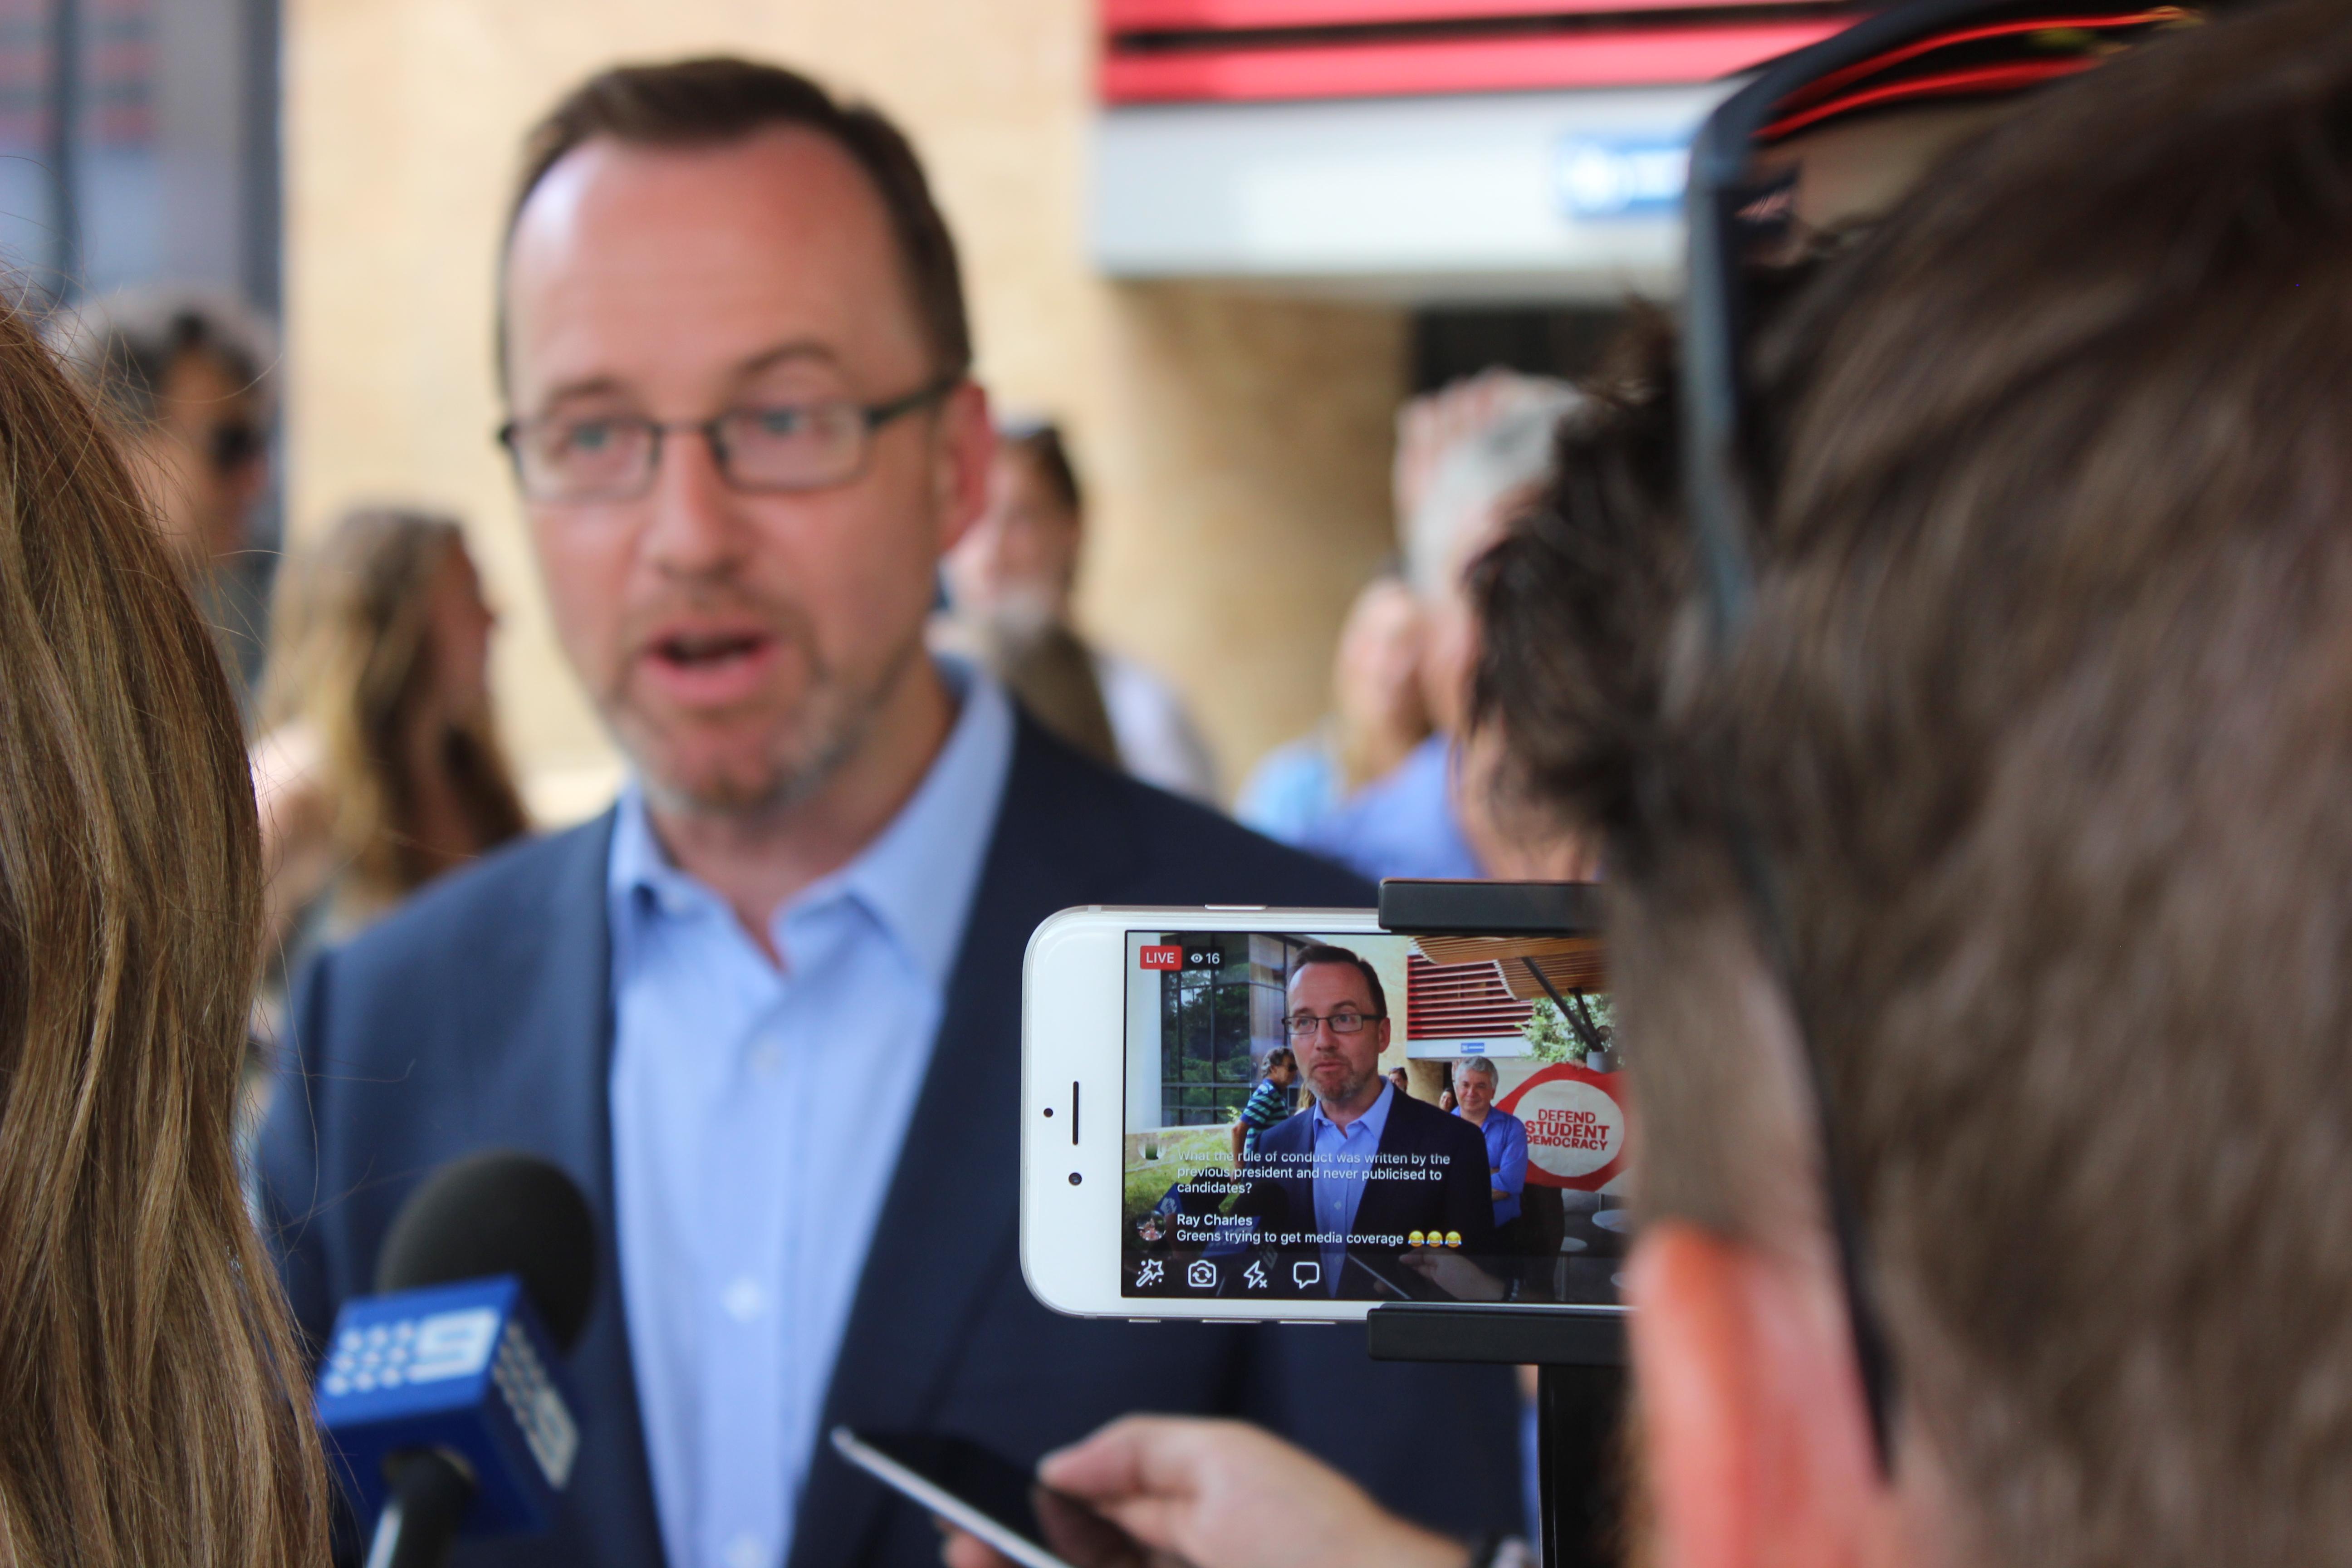 MP David Shoebridge speaks to media facebook live